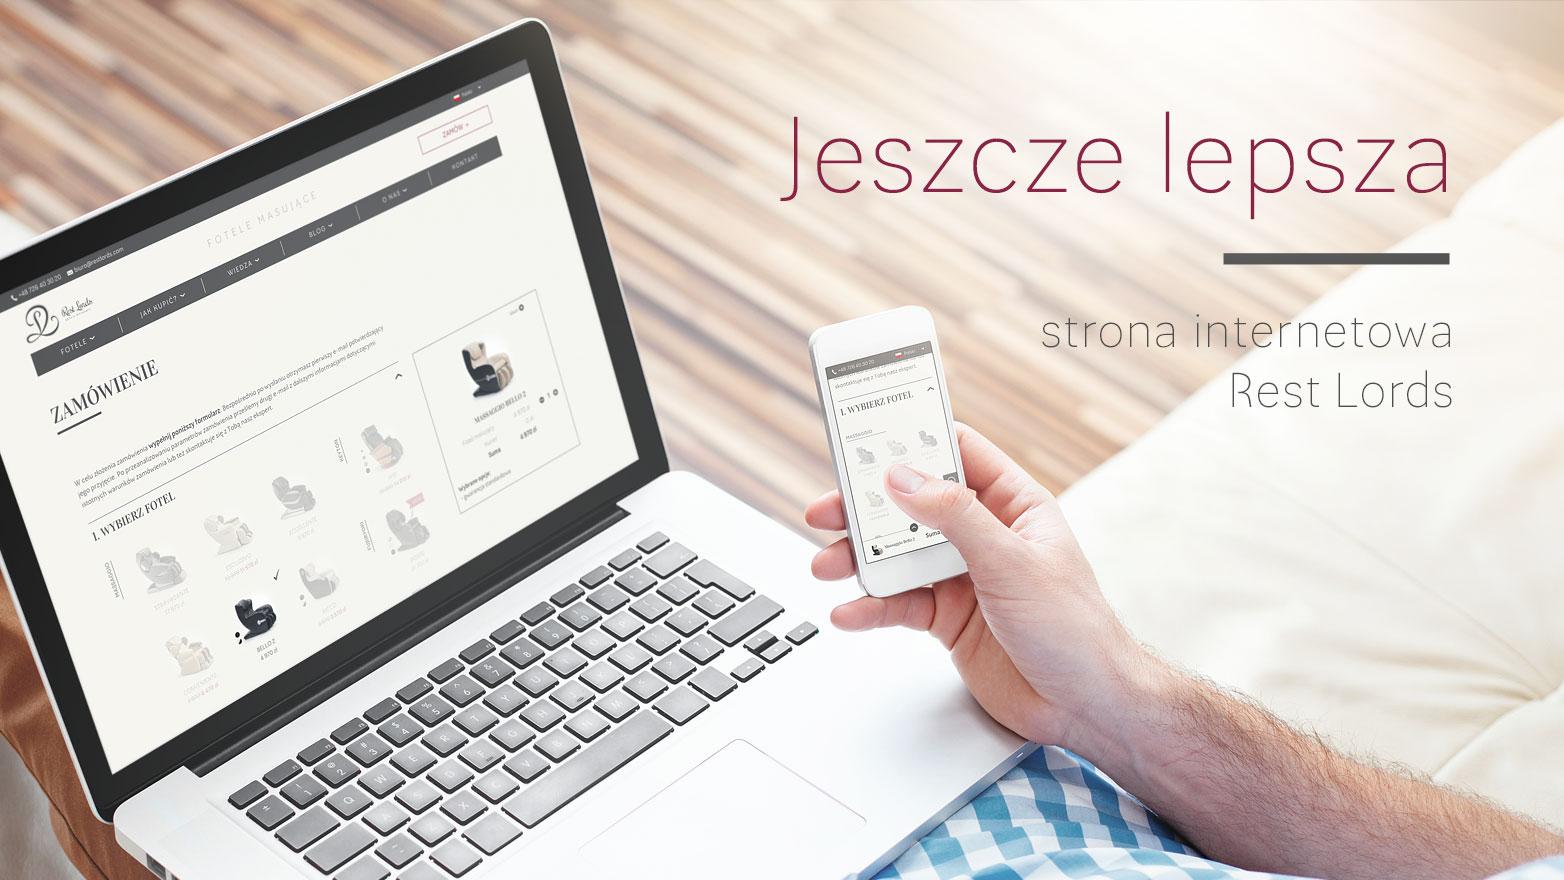 Ulepszona strona restlords.com